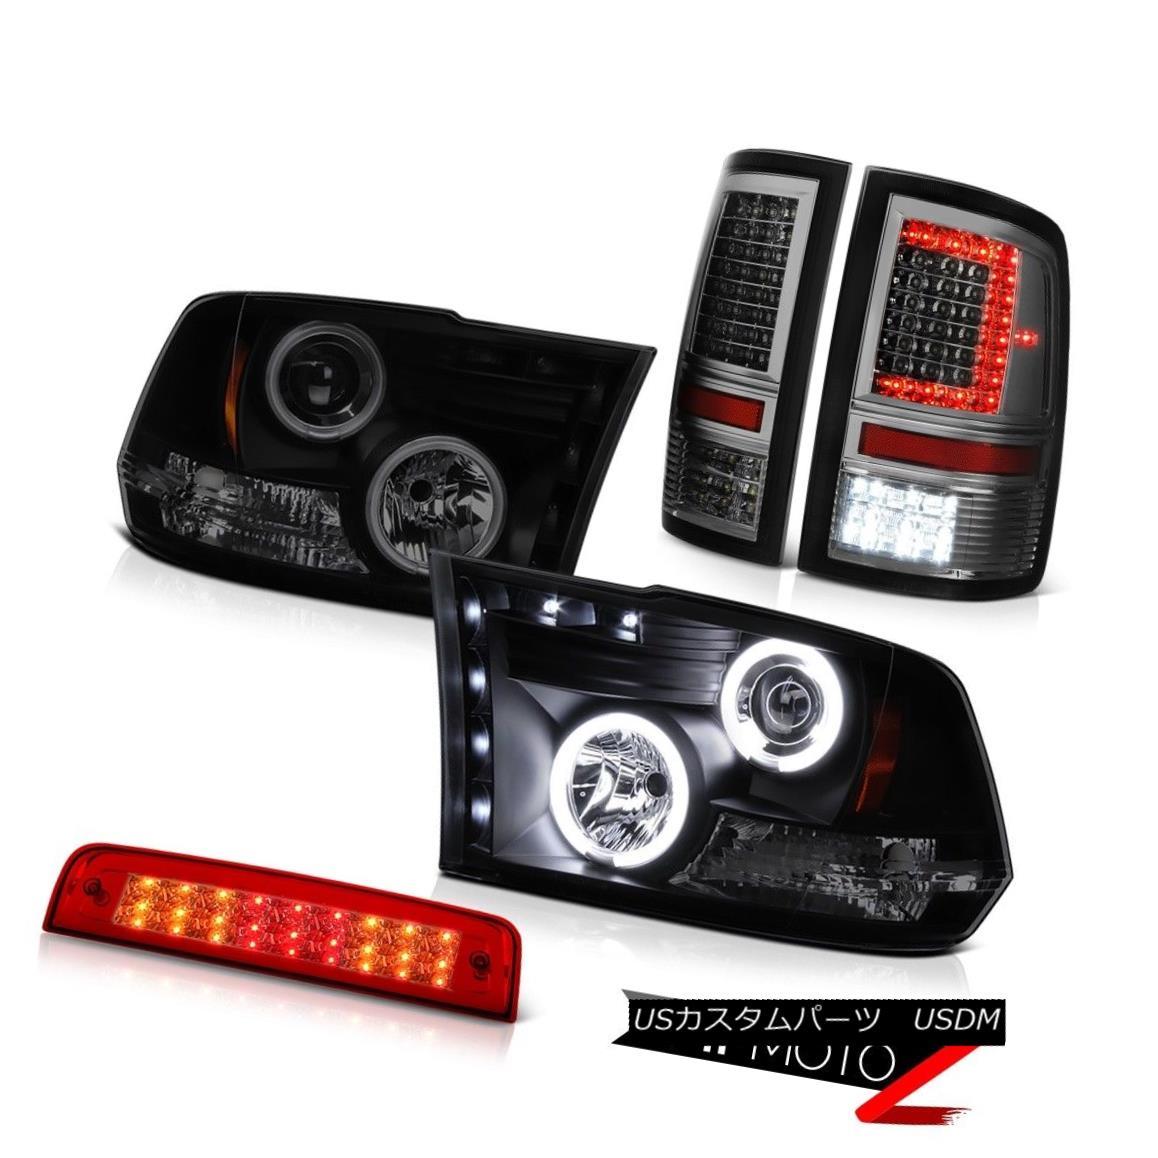 Purple LED DRL Halo Angel Eye Projector Fog Lights Lamp Kit Fits 02-08 Dodge Ram